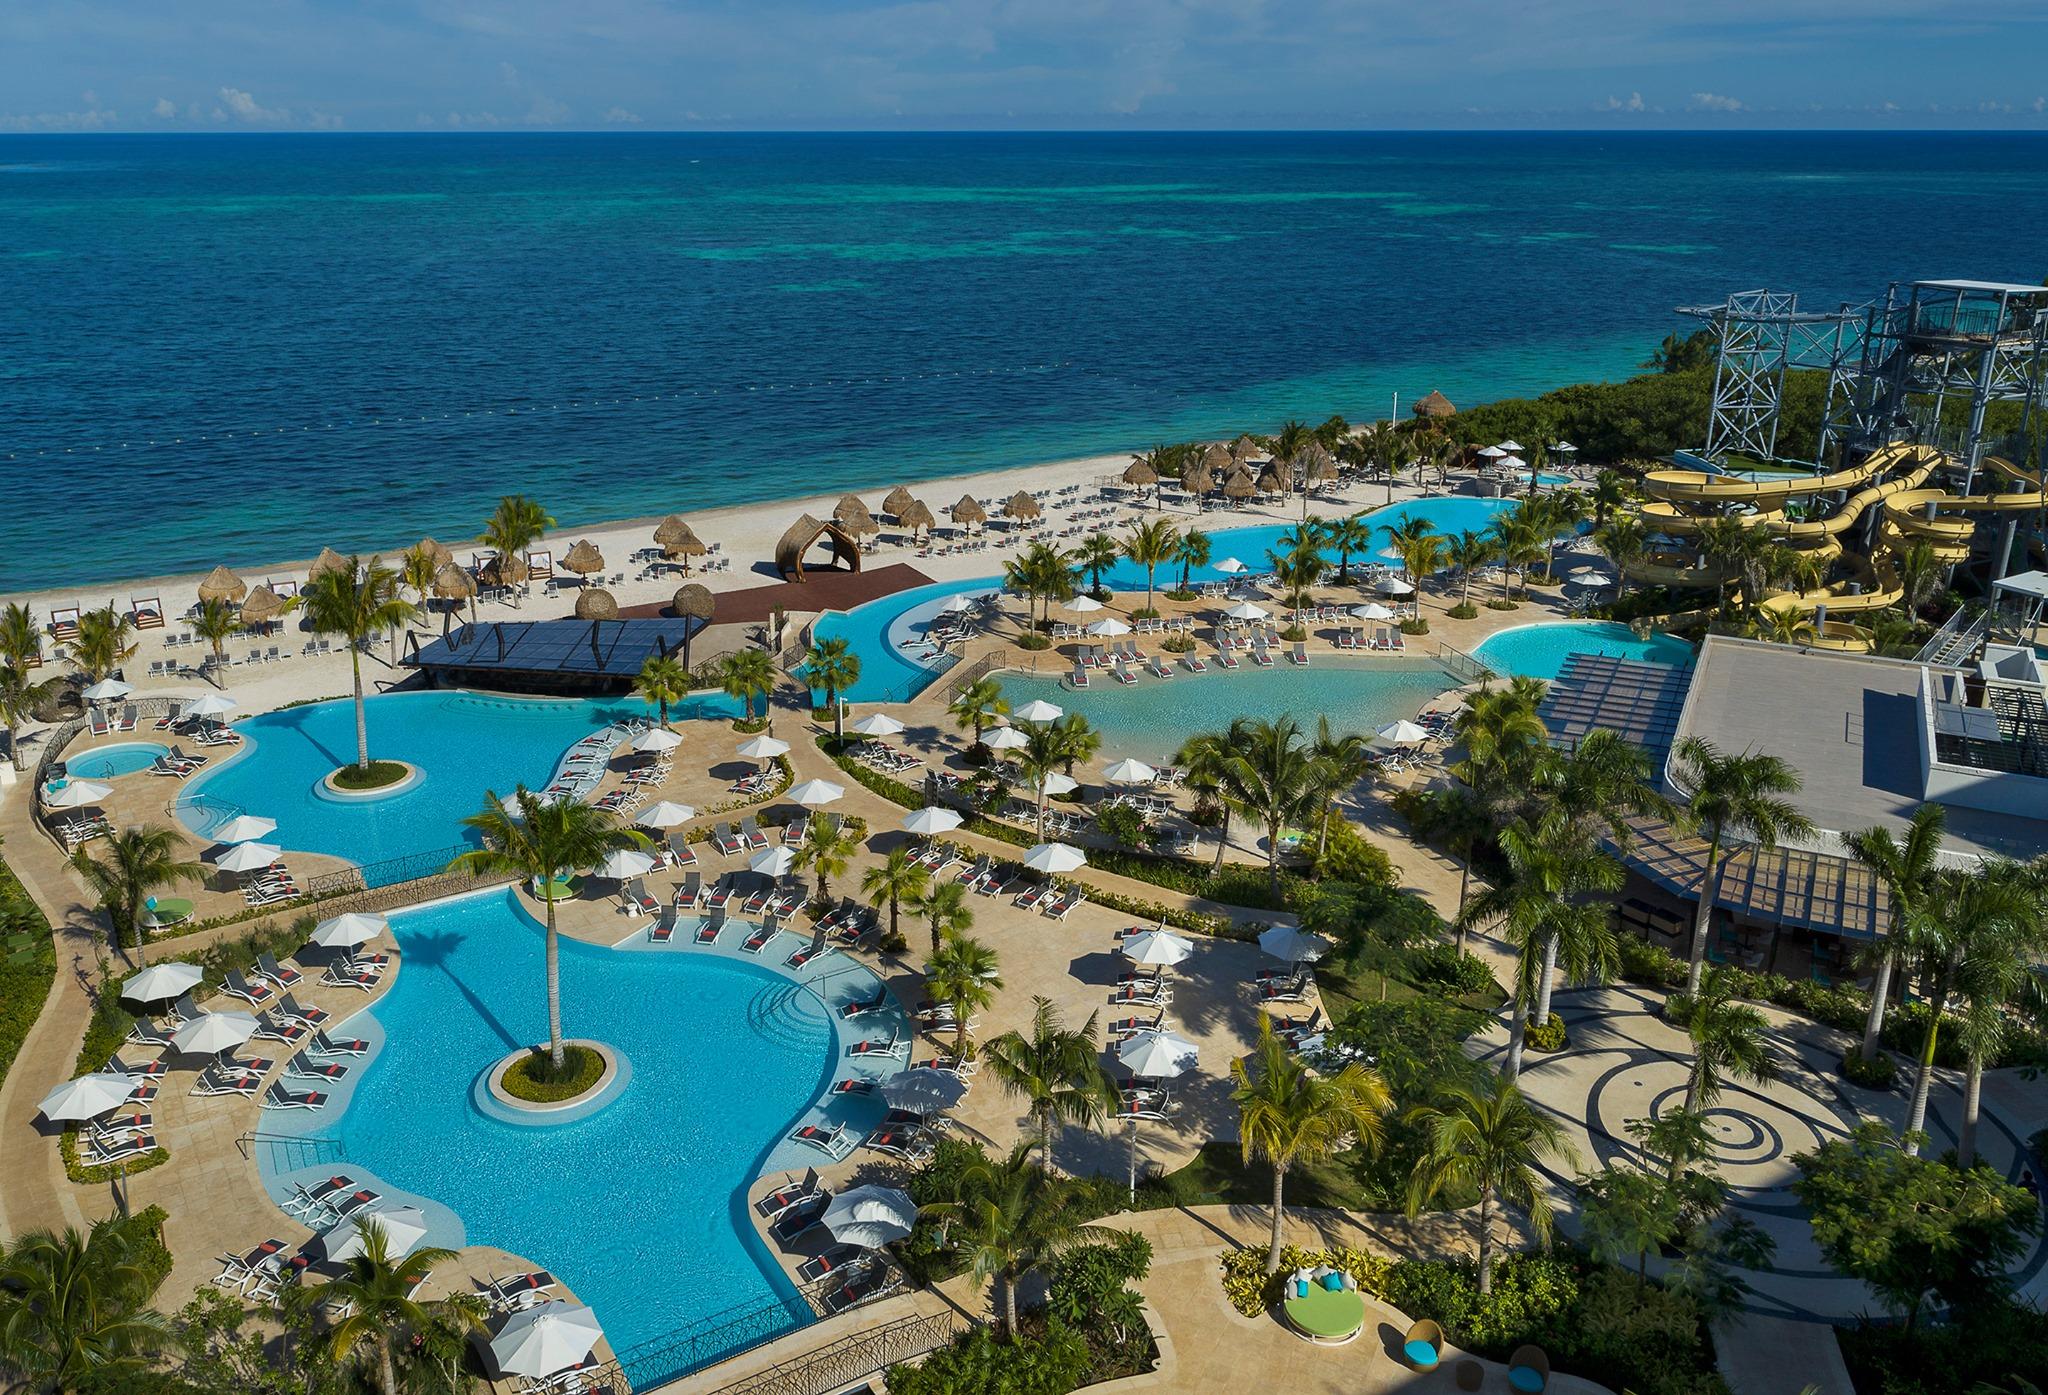 Dreams Natura Resort & Spa - Family Friendly All Inclusive Resort